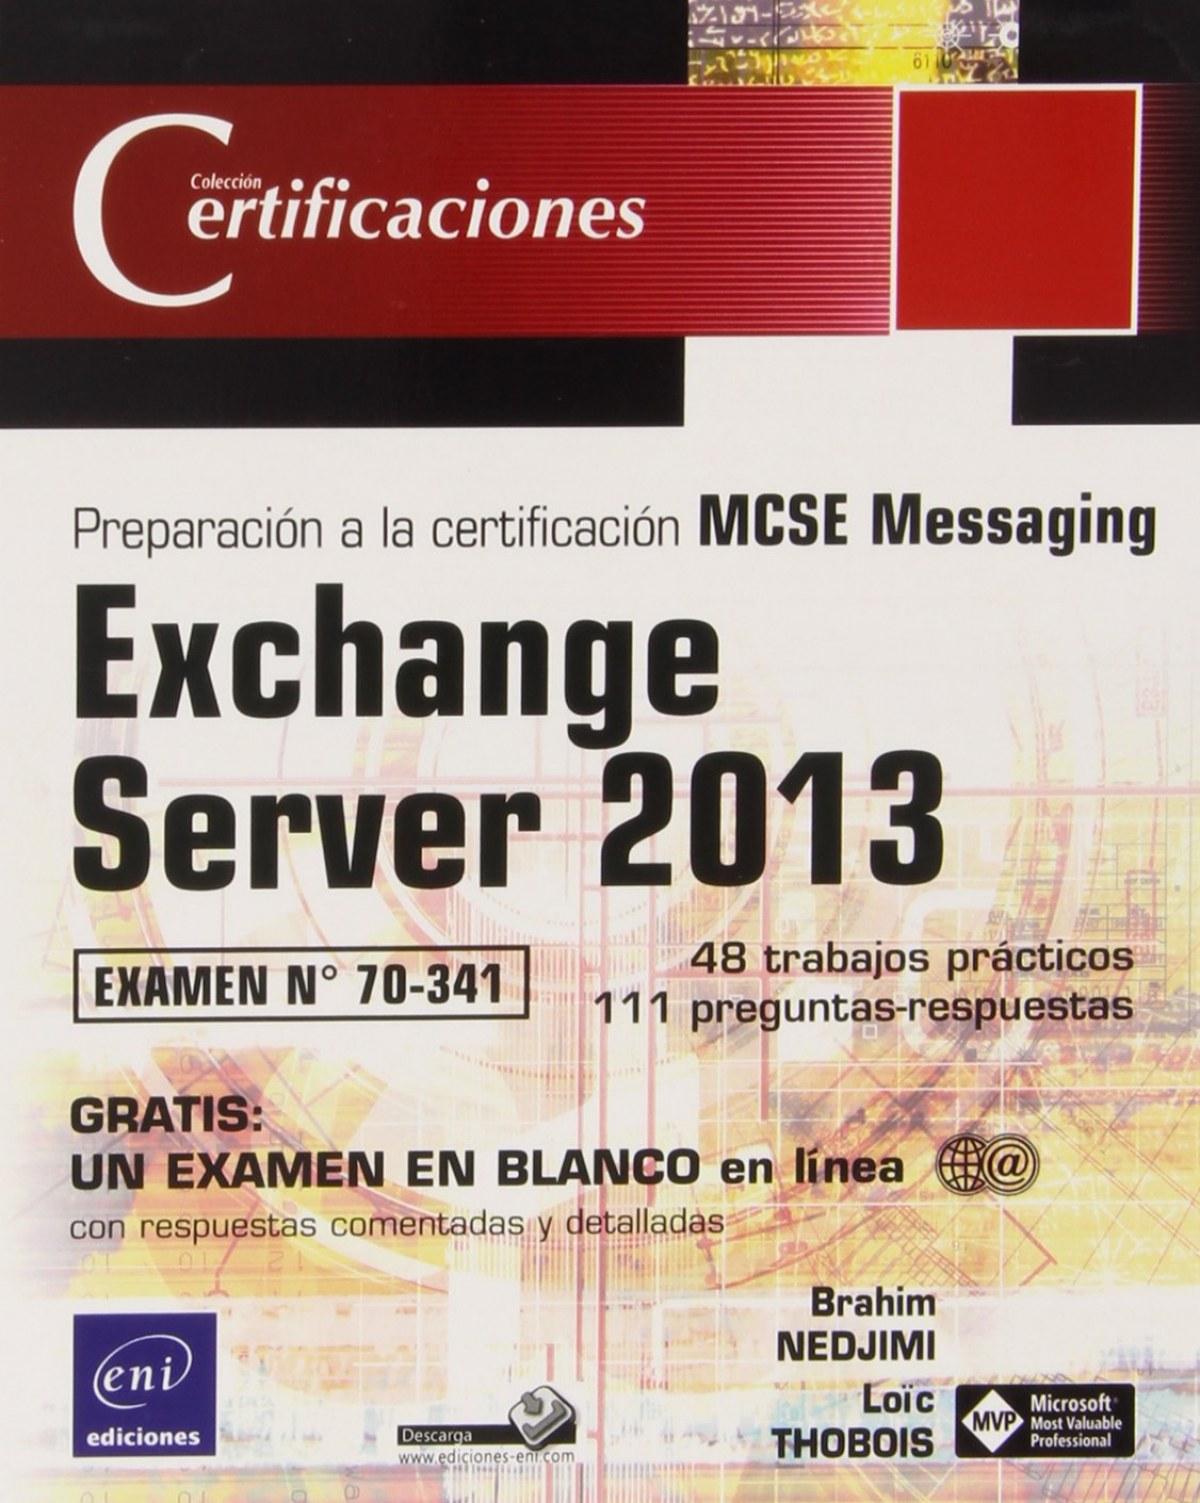 Certificaciones Exchange Server 2013 Examen 70-341